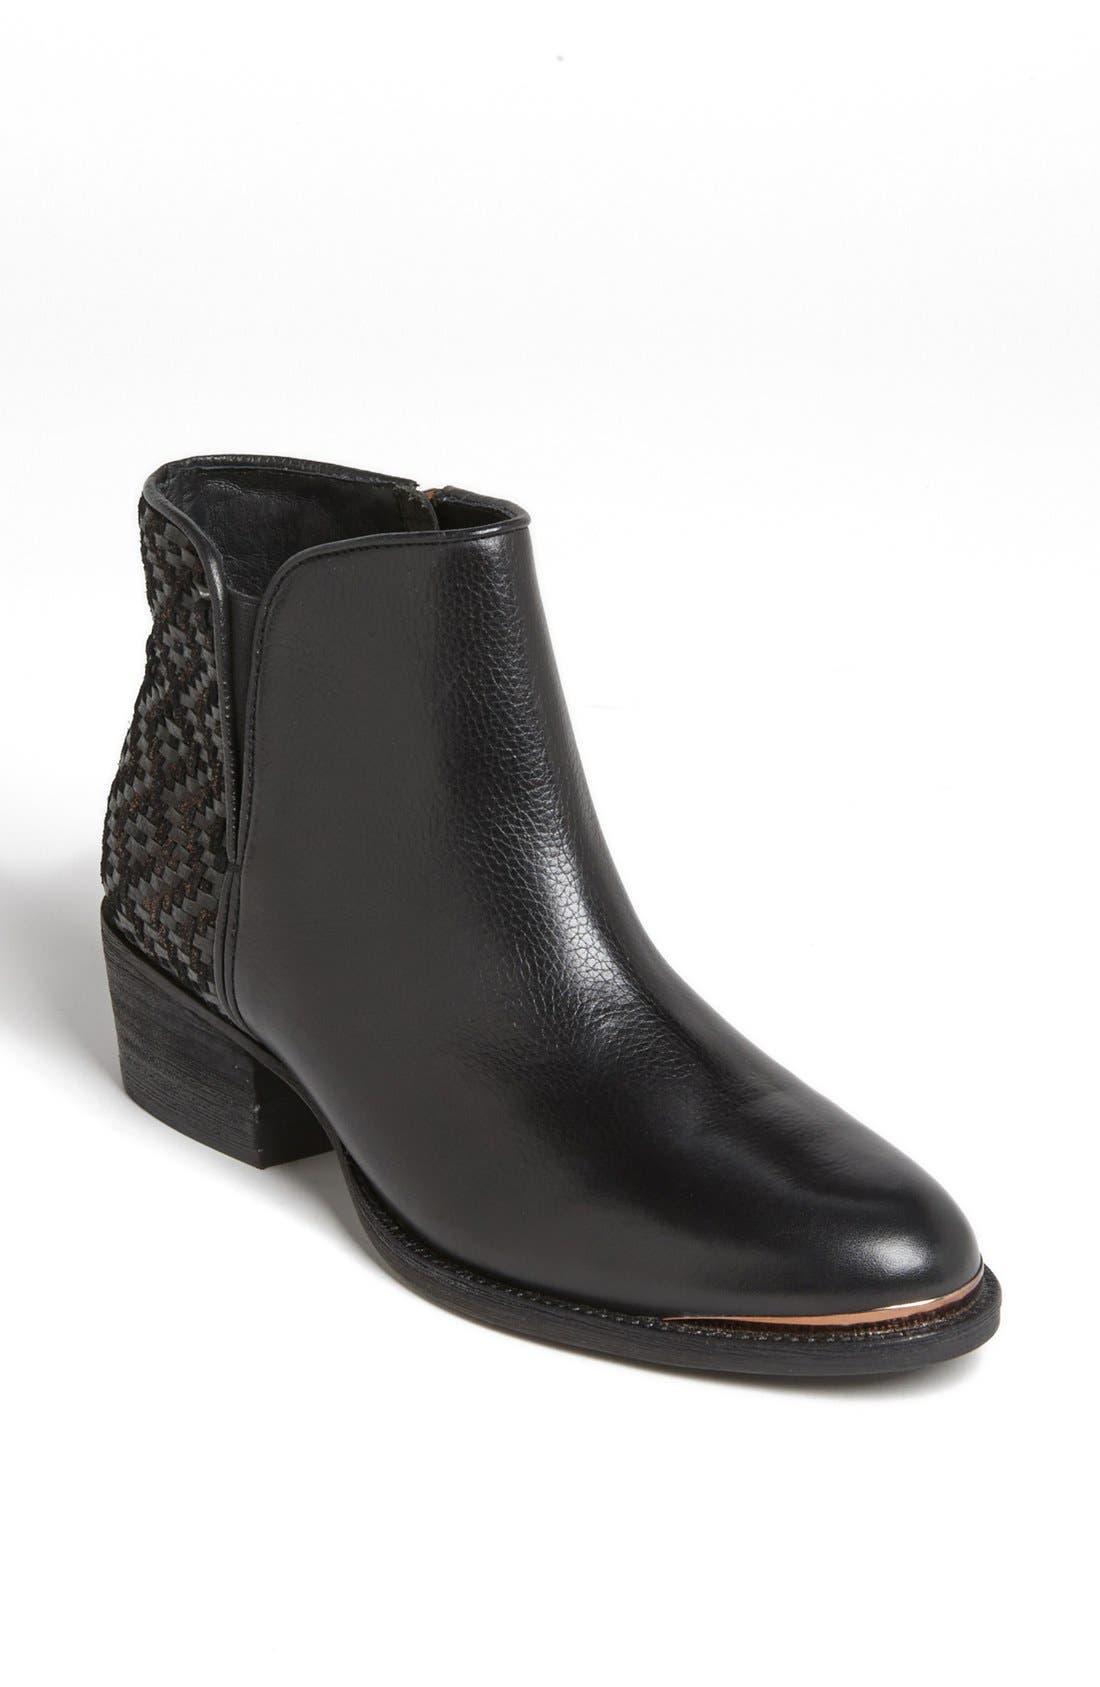 Elliot Lucca 'Rosa' Boot,                         Main,                         color,